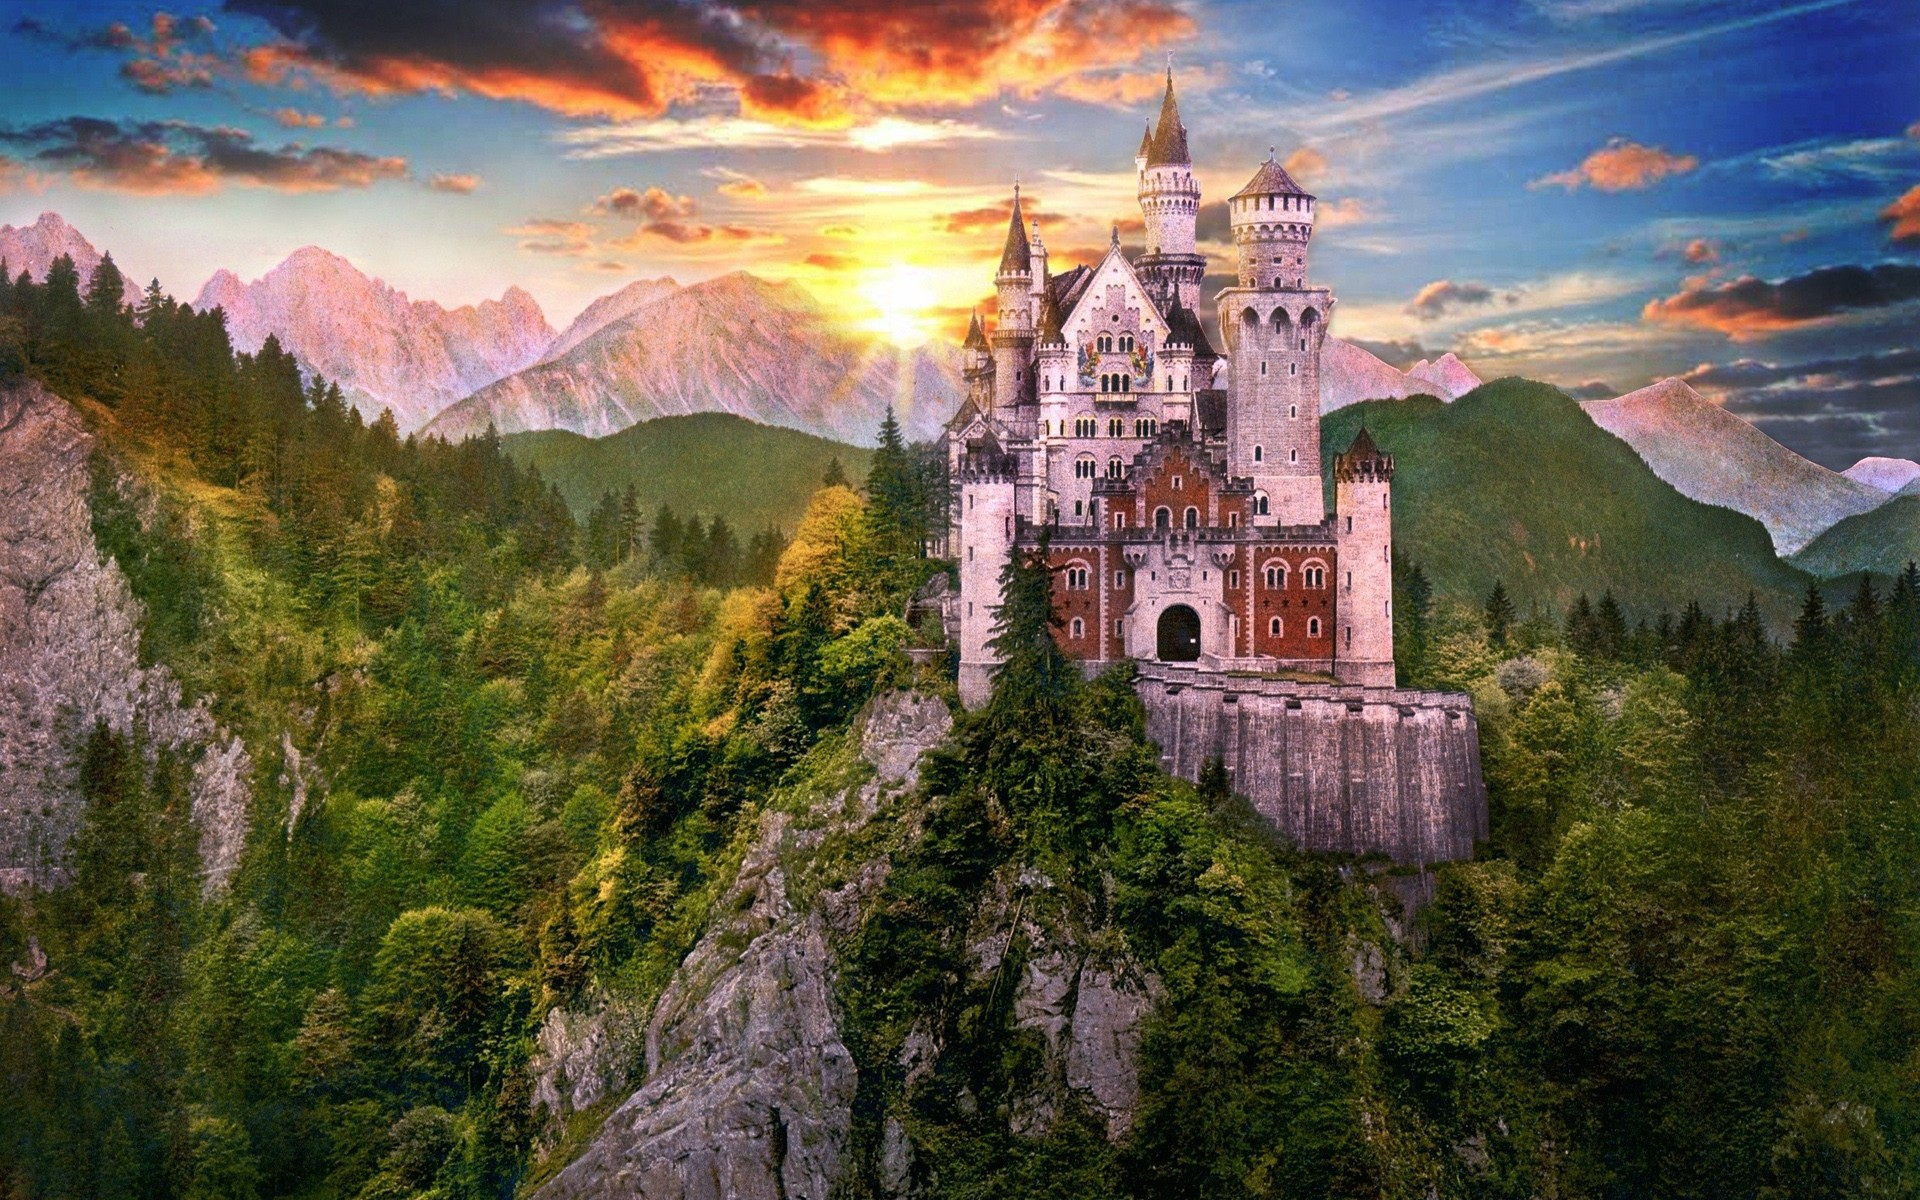 Fantasy Castle HD Wallpaper #10766